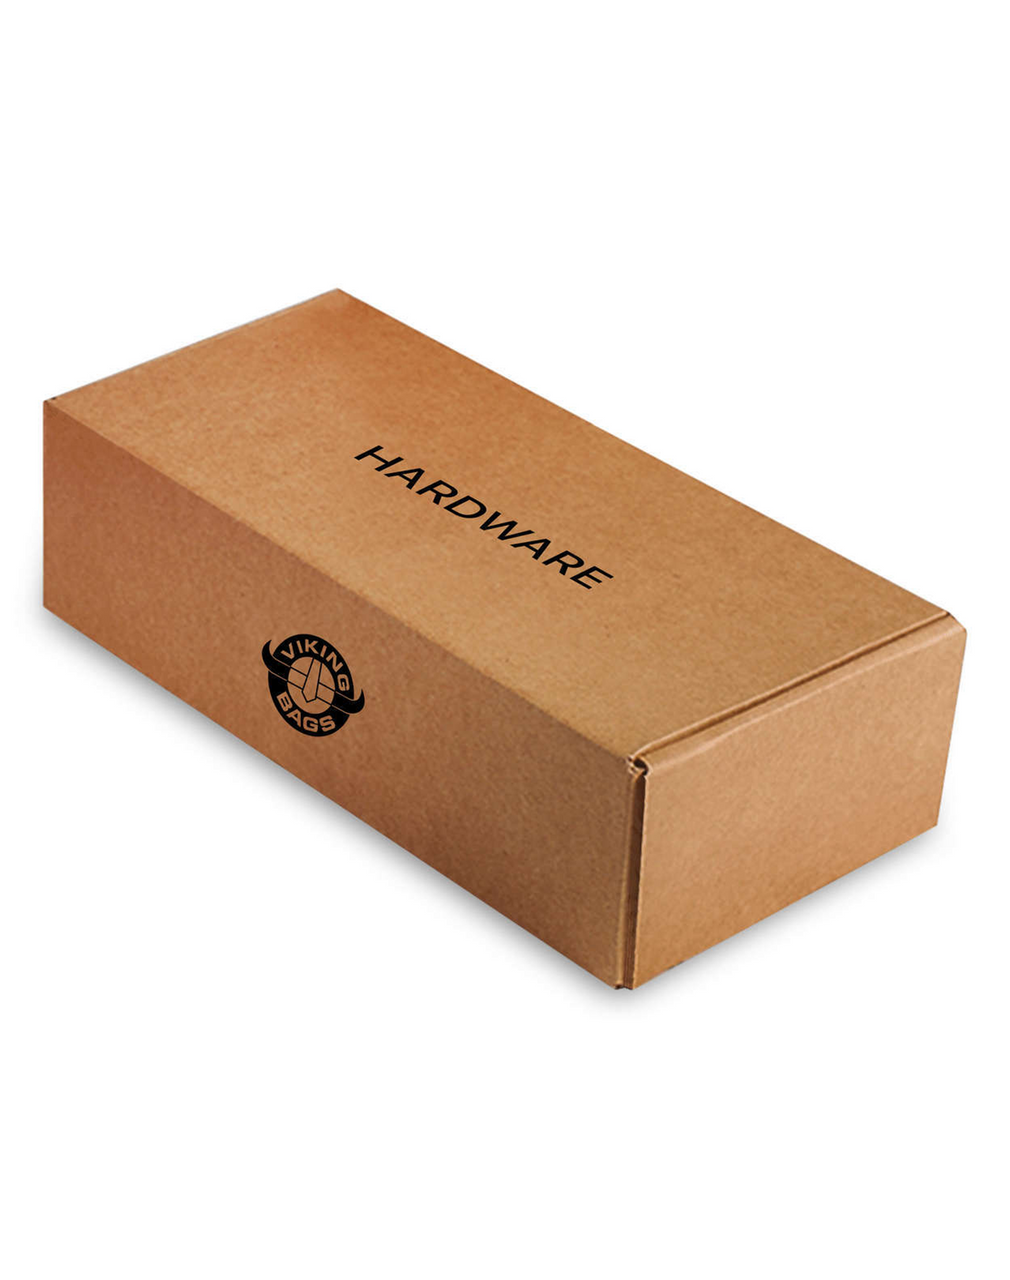 Honda 1500 Valkyrie Interstate Charger Medium Single Strap Motorcycle Saddlebags Hardware Box